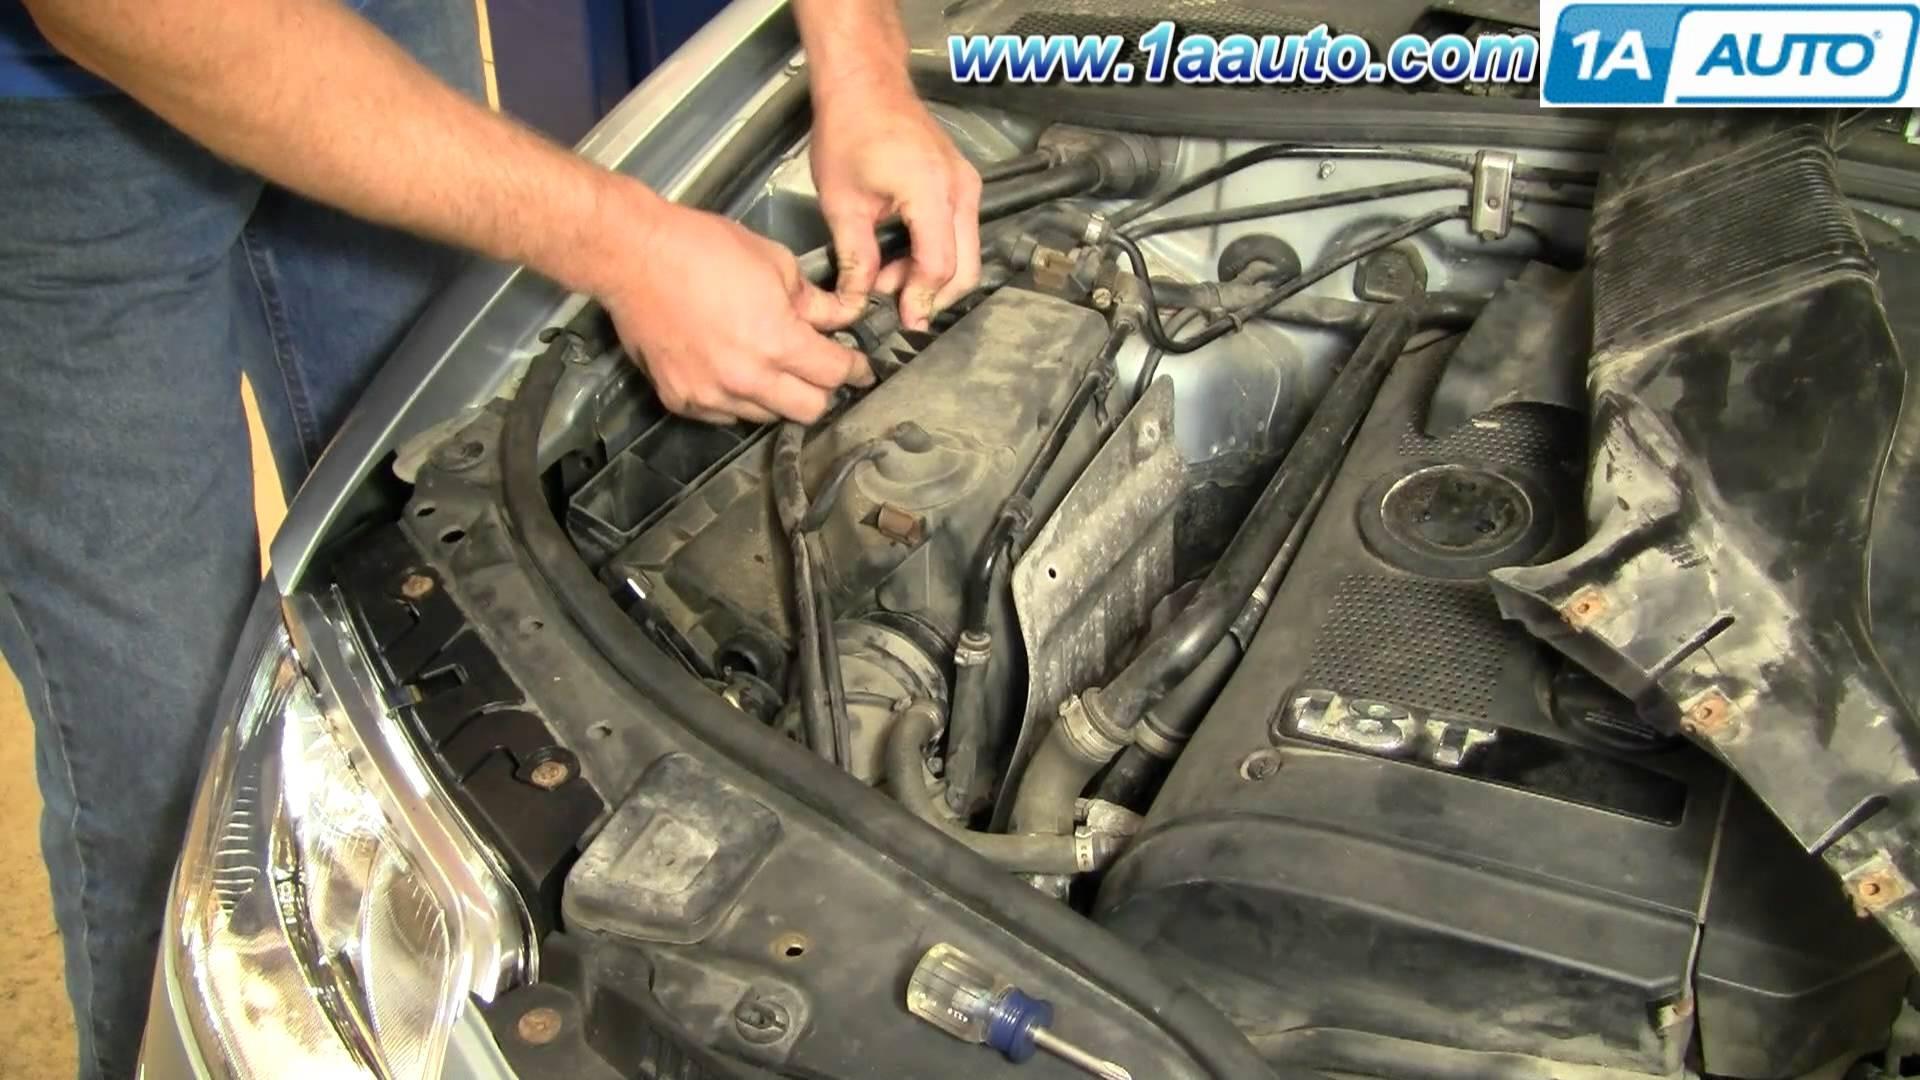 2001 Vw Passat Engine Diagram How to Install Replace Engine Air Filter Volkswagen Passat 02 05 Of 2001 Vw Passat Engine Diagram